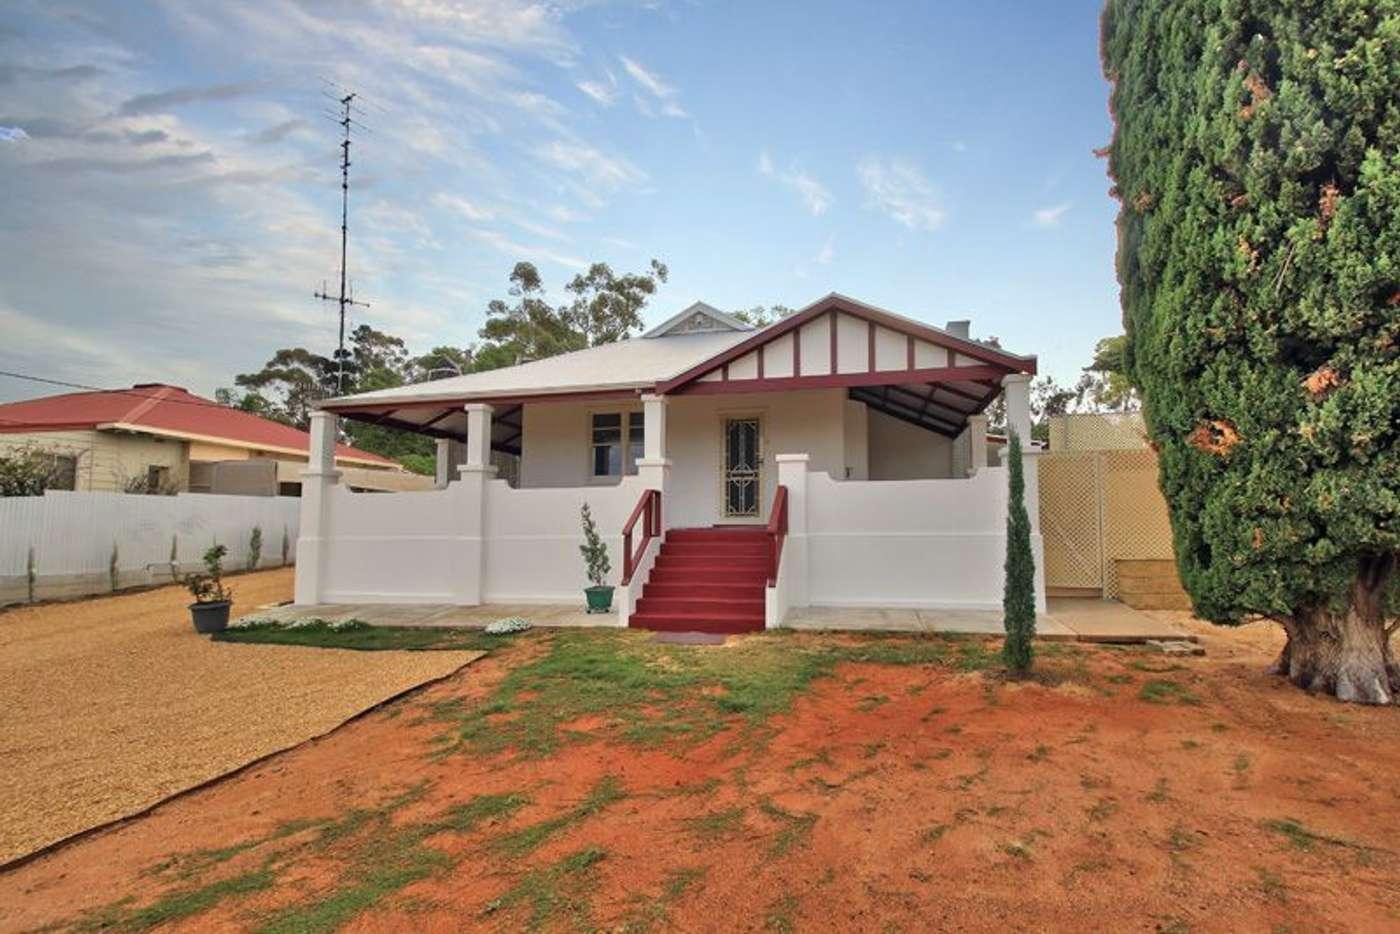 Main view of Homely house listing, 3 O'Hanez Street, Berri SA 5343